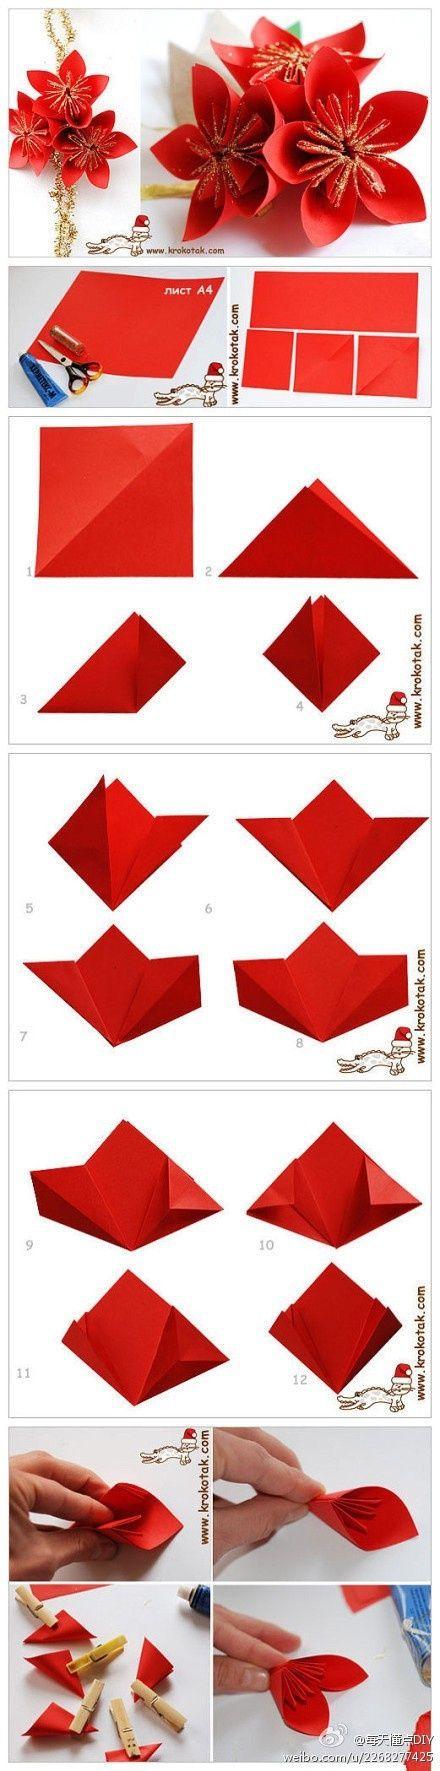 Origami Poinsettia christmas diy ideas craft flowers paper crafts origami christmas crafts christmas decorations christmas decor christmas crafts for kids chistmas diy